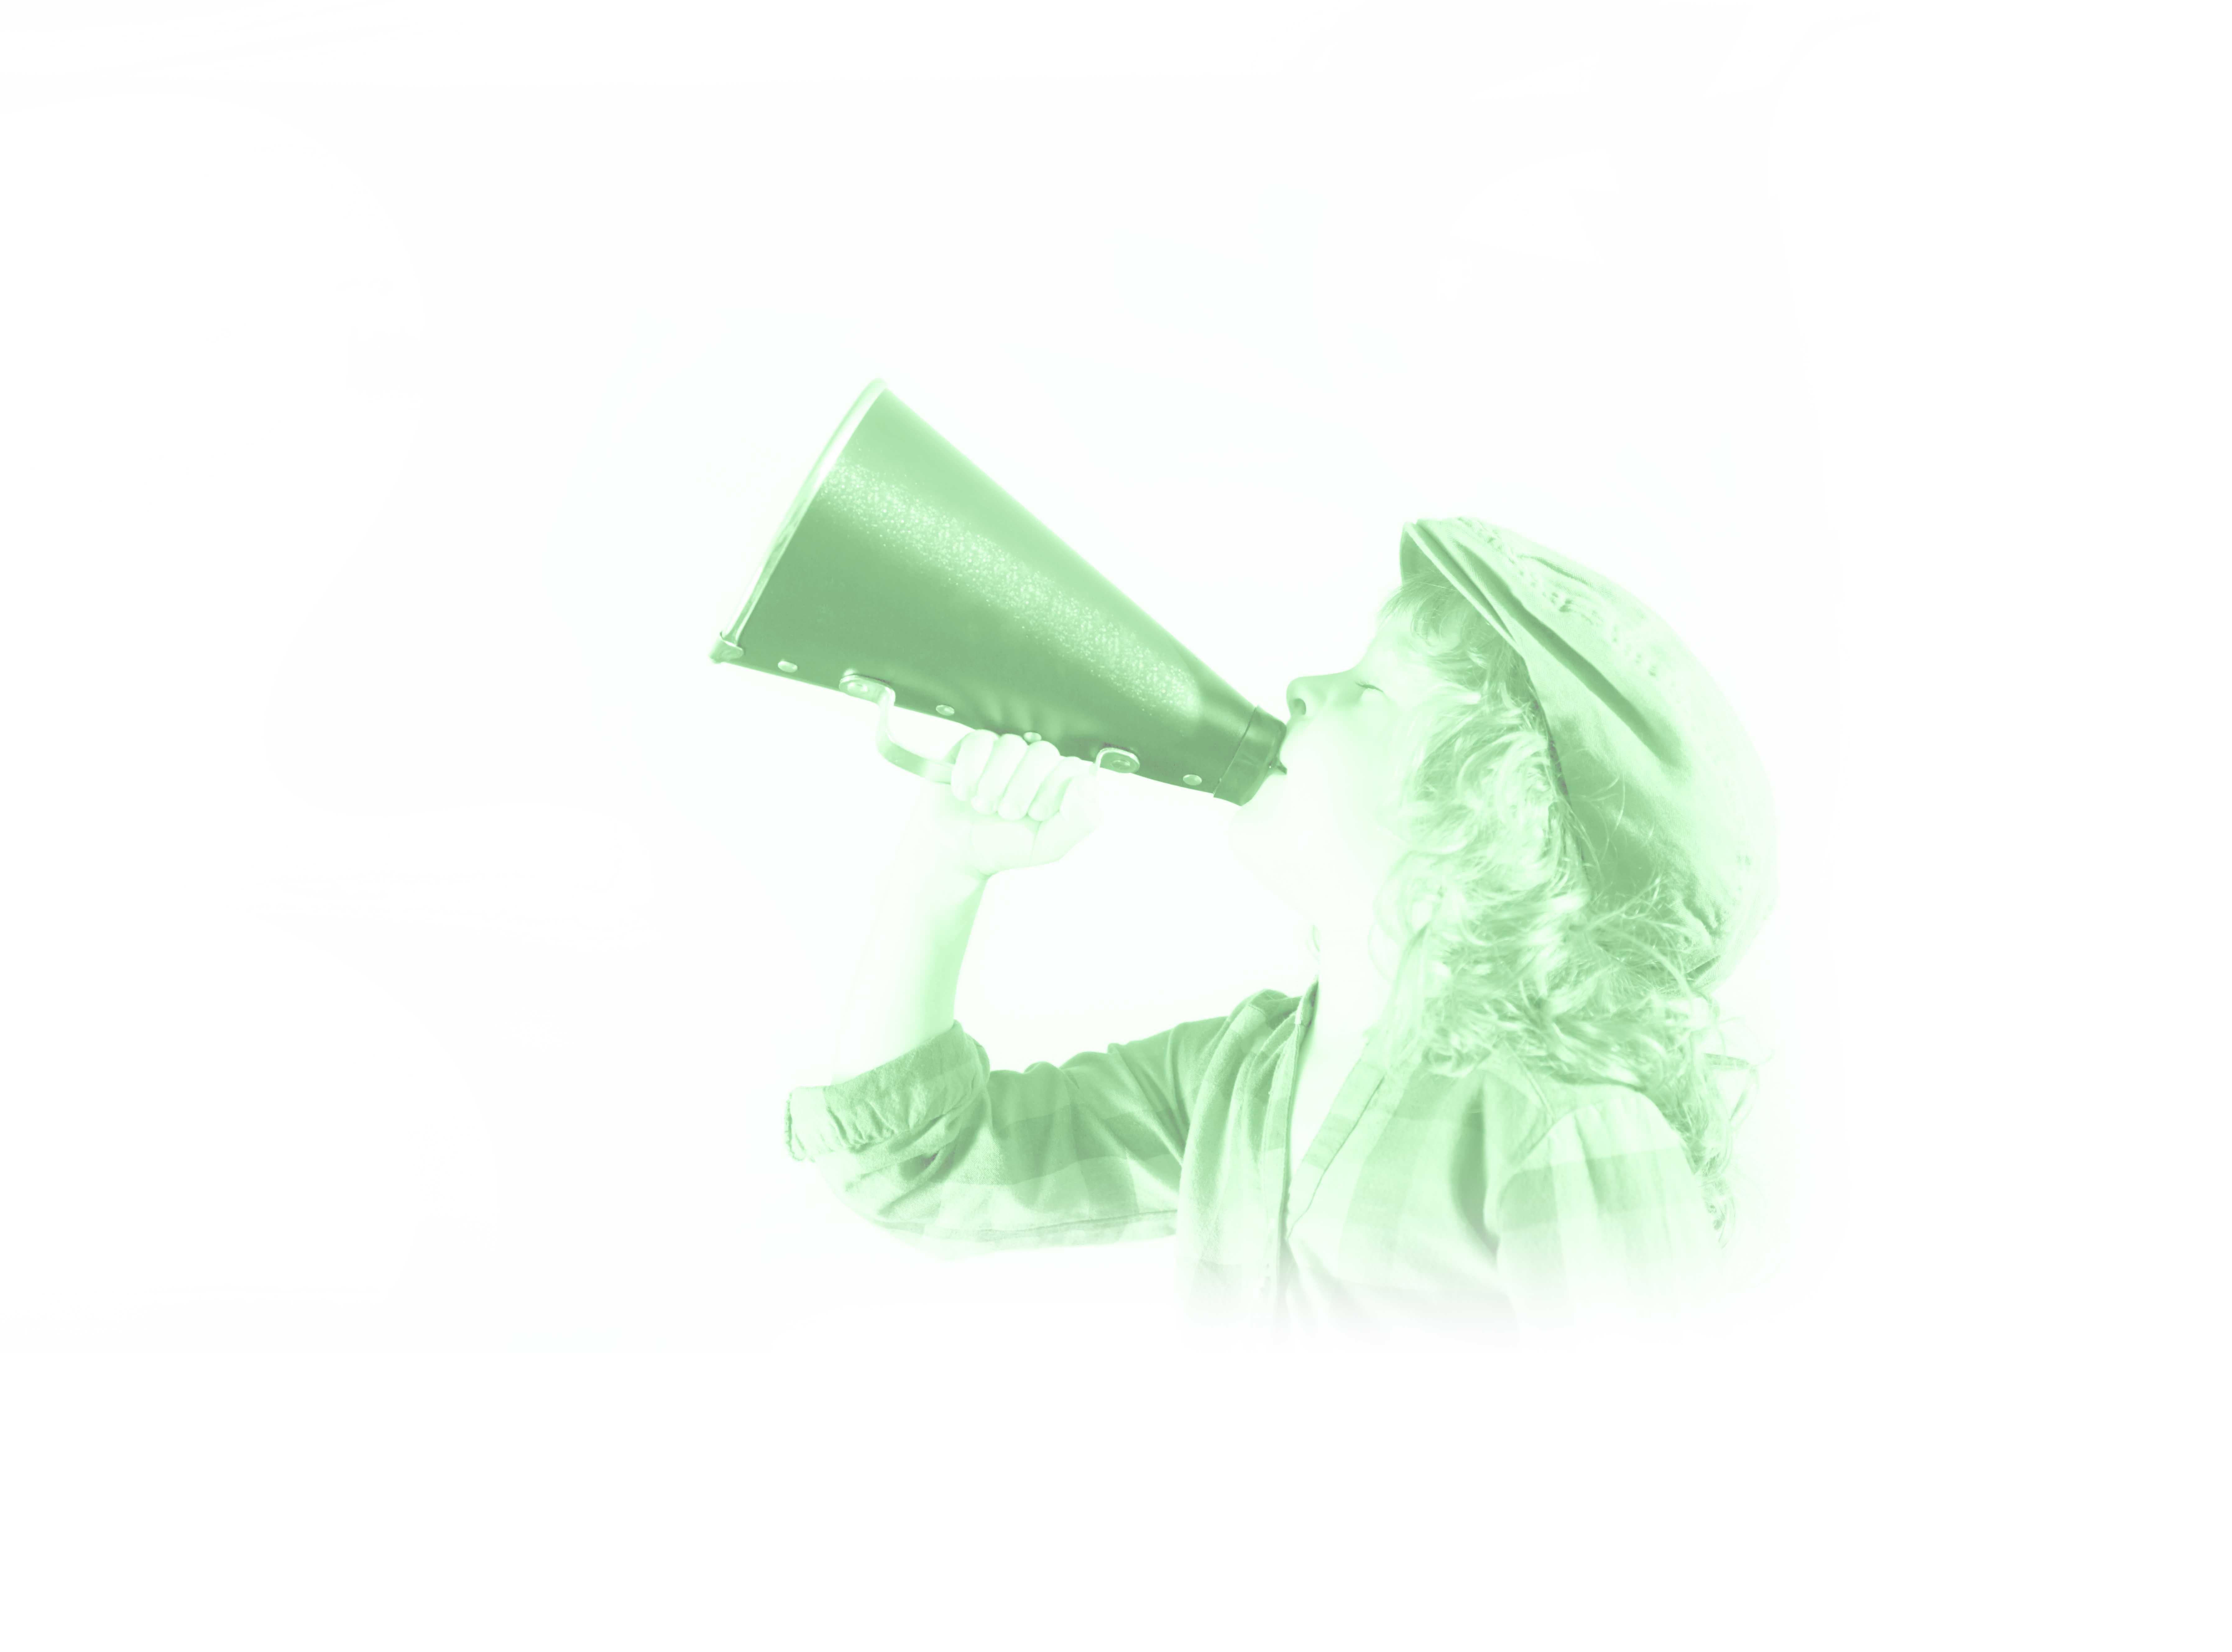 Kid-met-toeter-HR-Bewerkt-Groen-uitsnede2